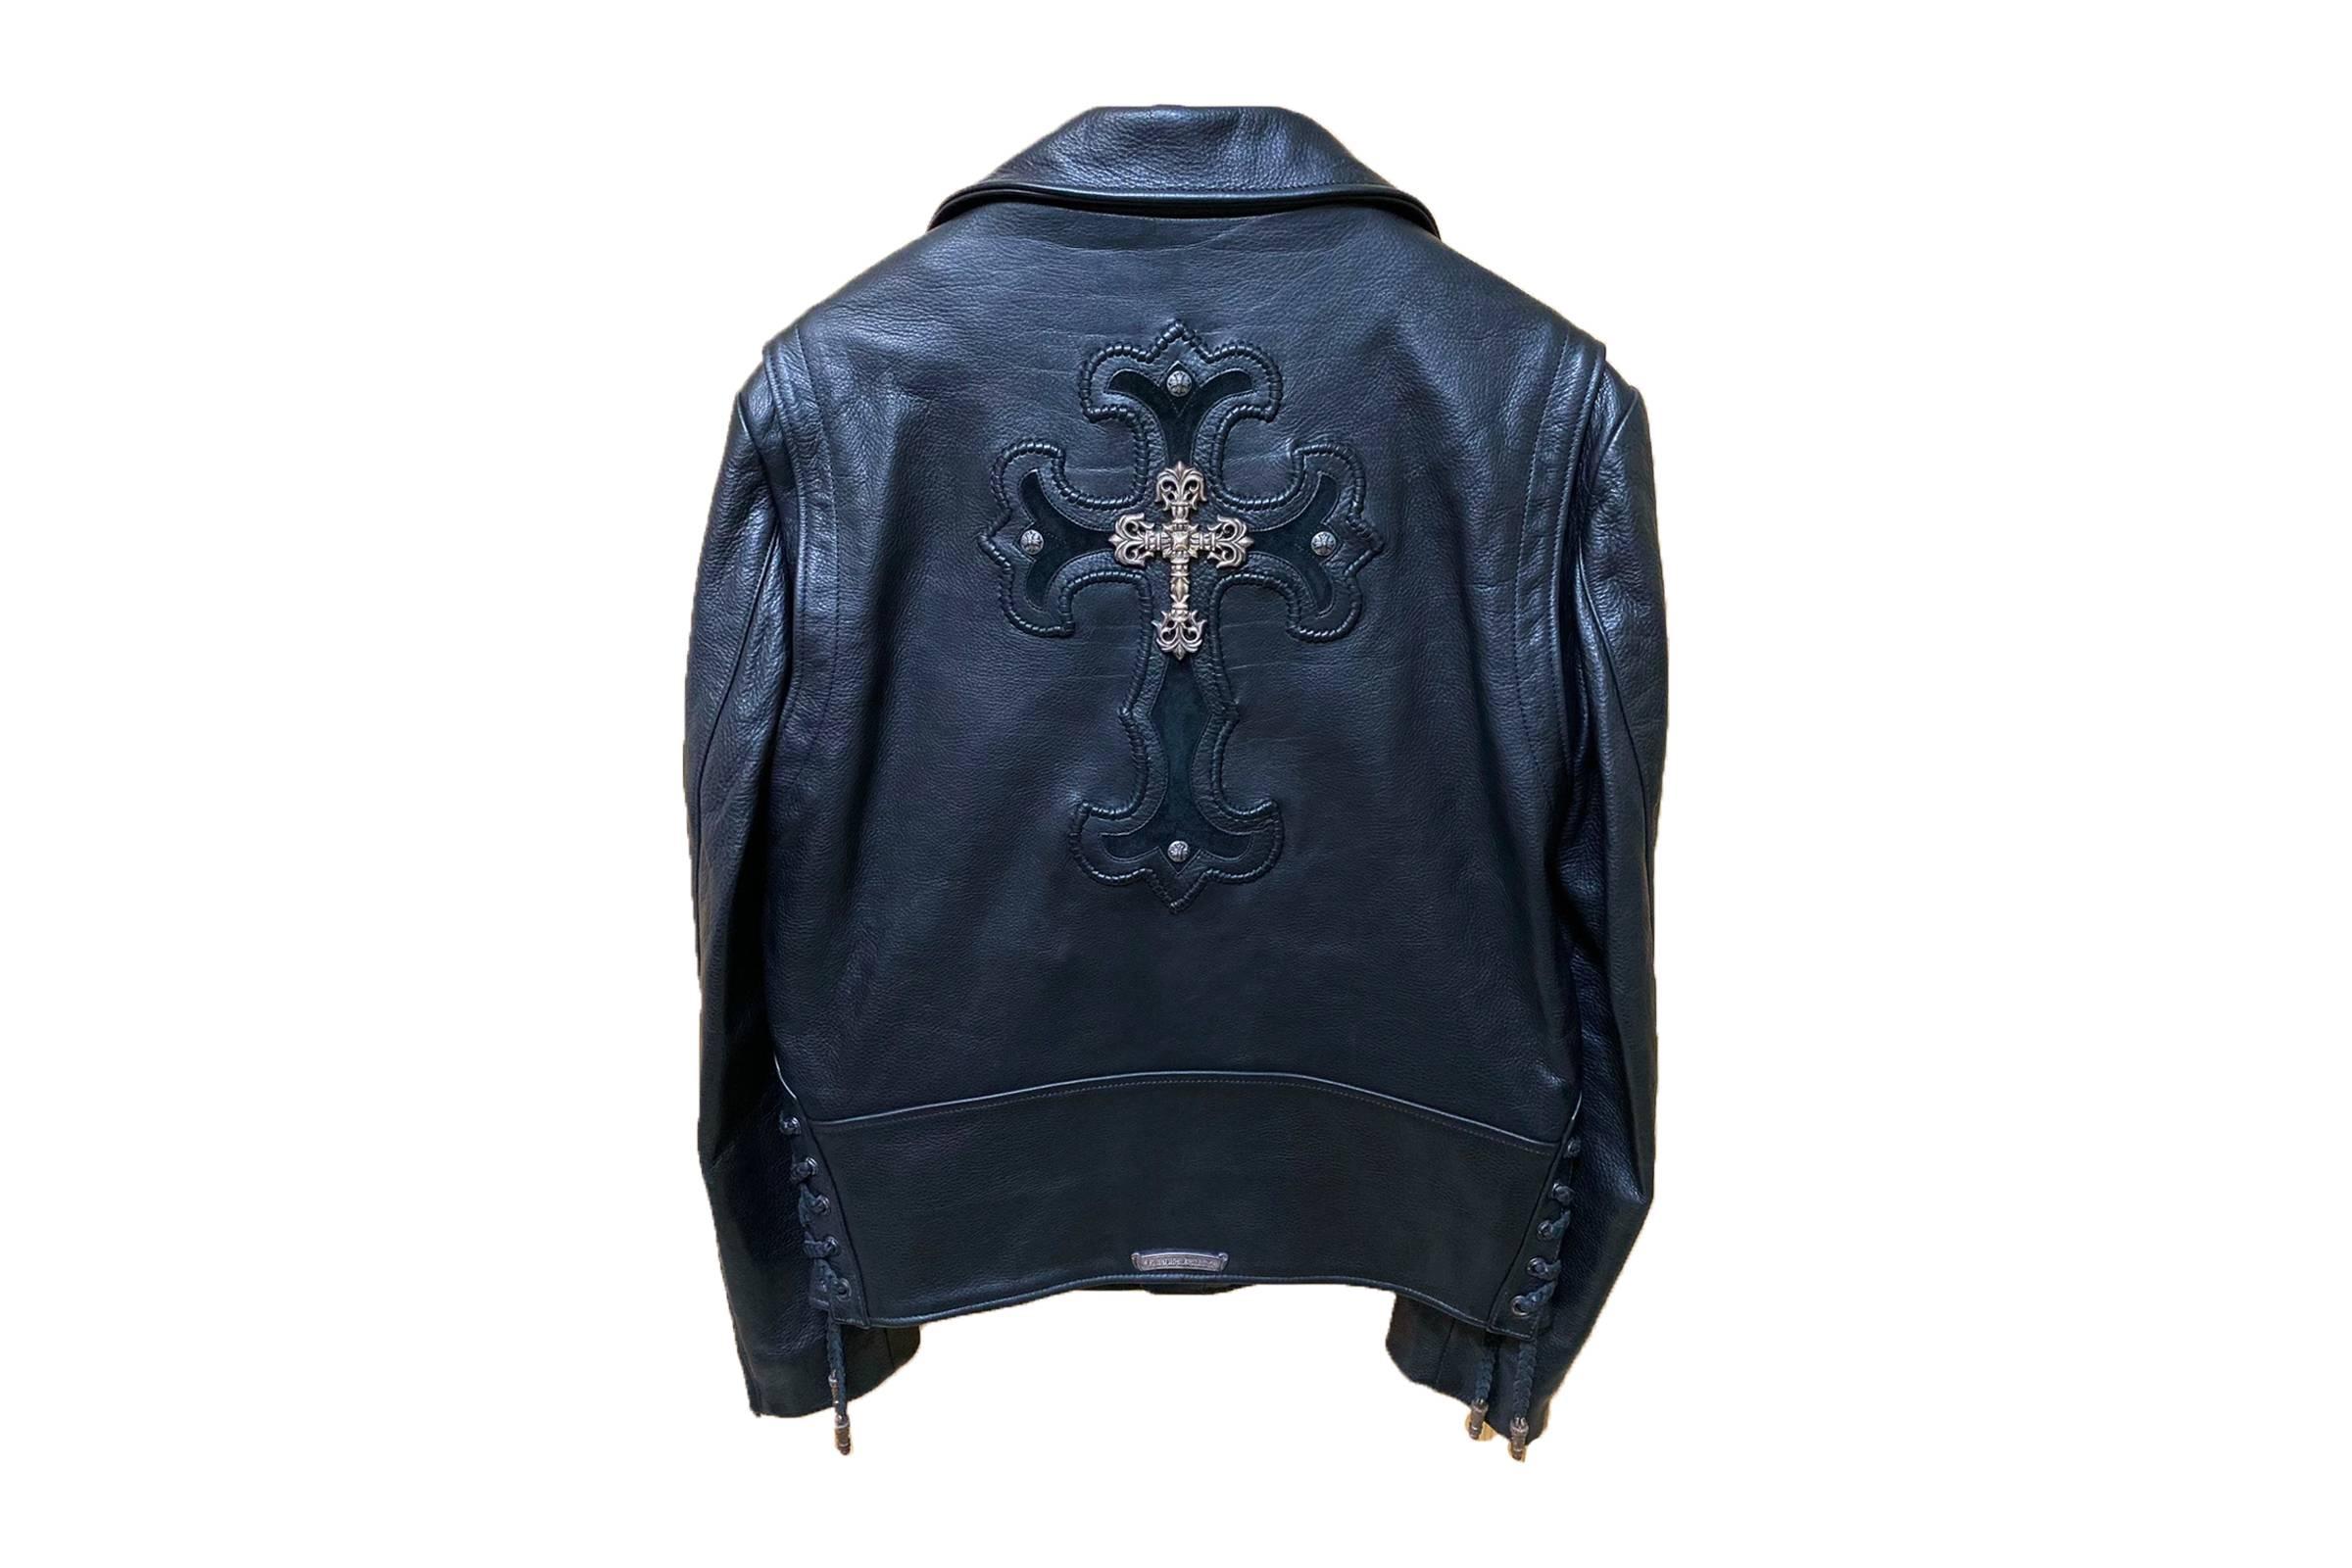 Chrome Hearts JJ Leather Jacket